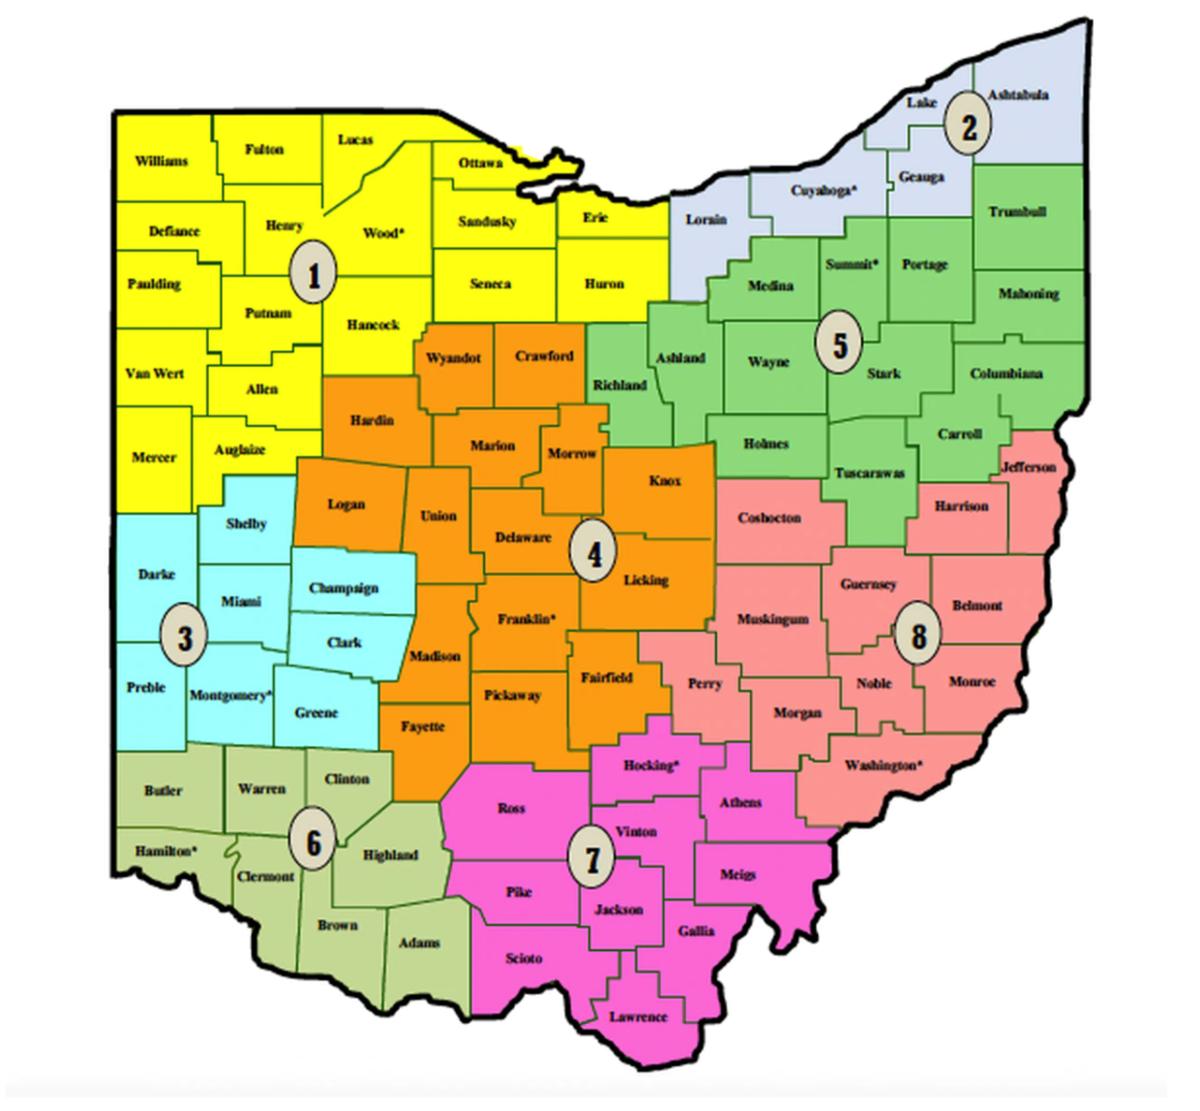 Will Your Insurance Cover Treatment At Ohio's Coronavirus